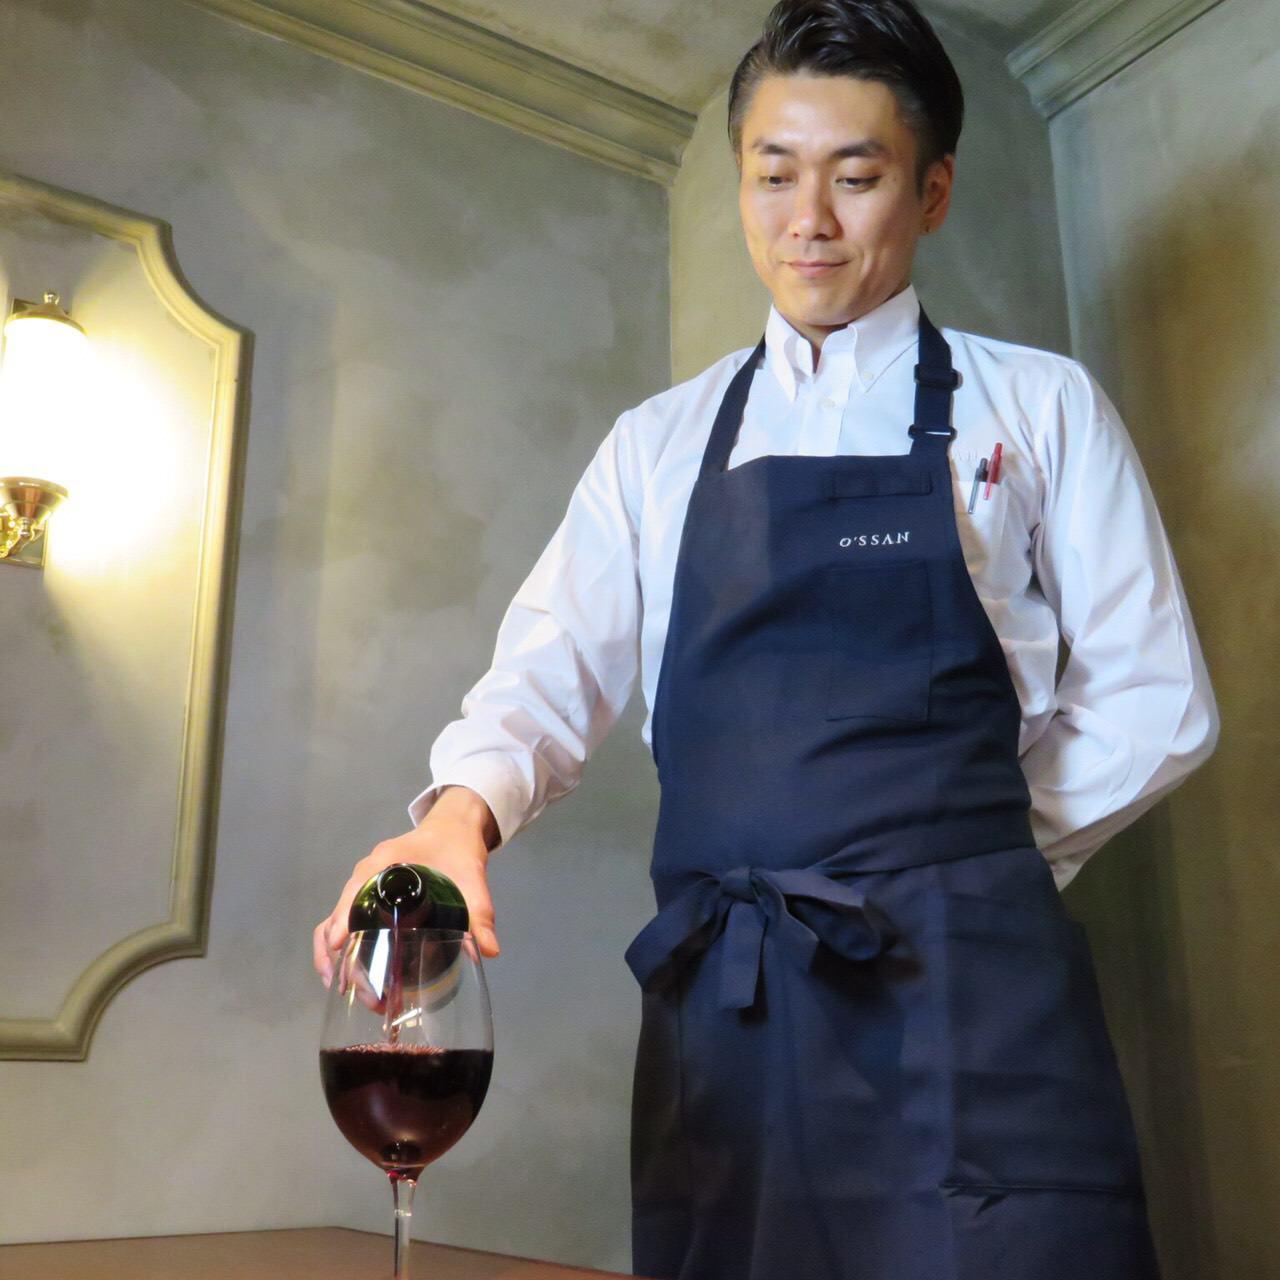 ワイン常時80種類以上